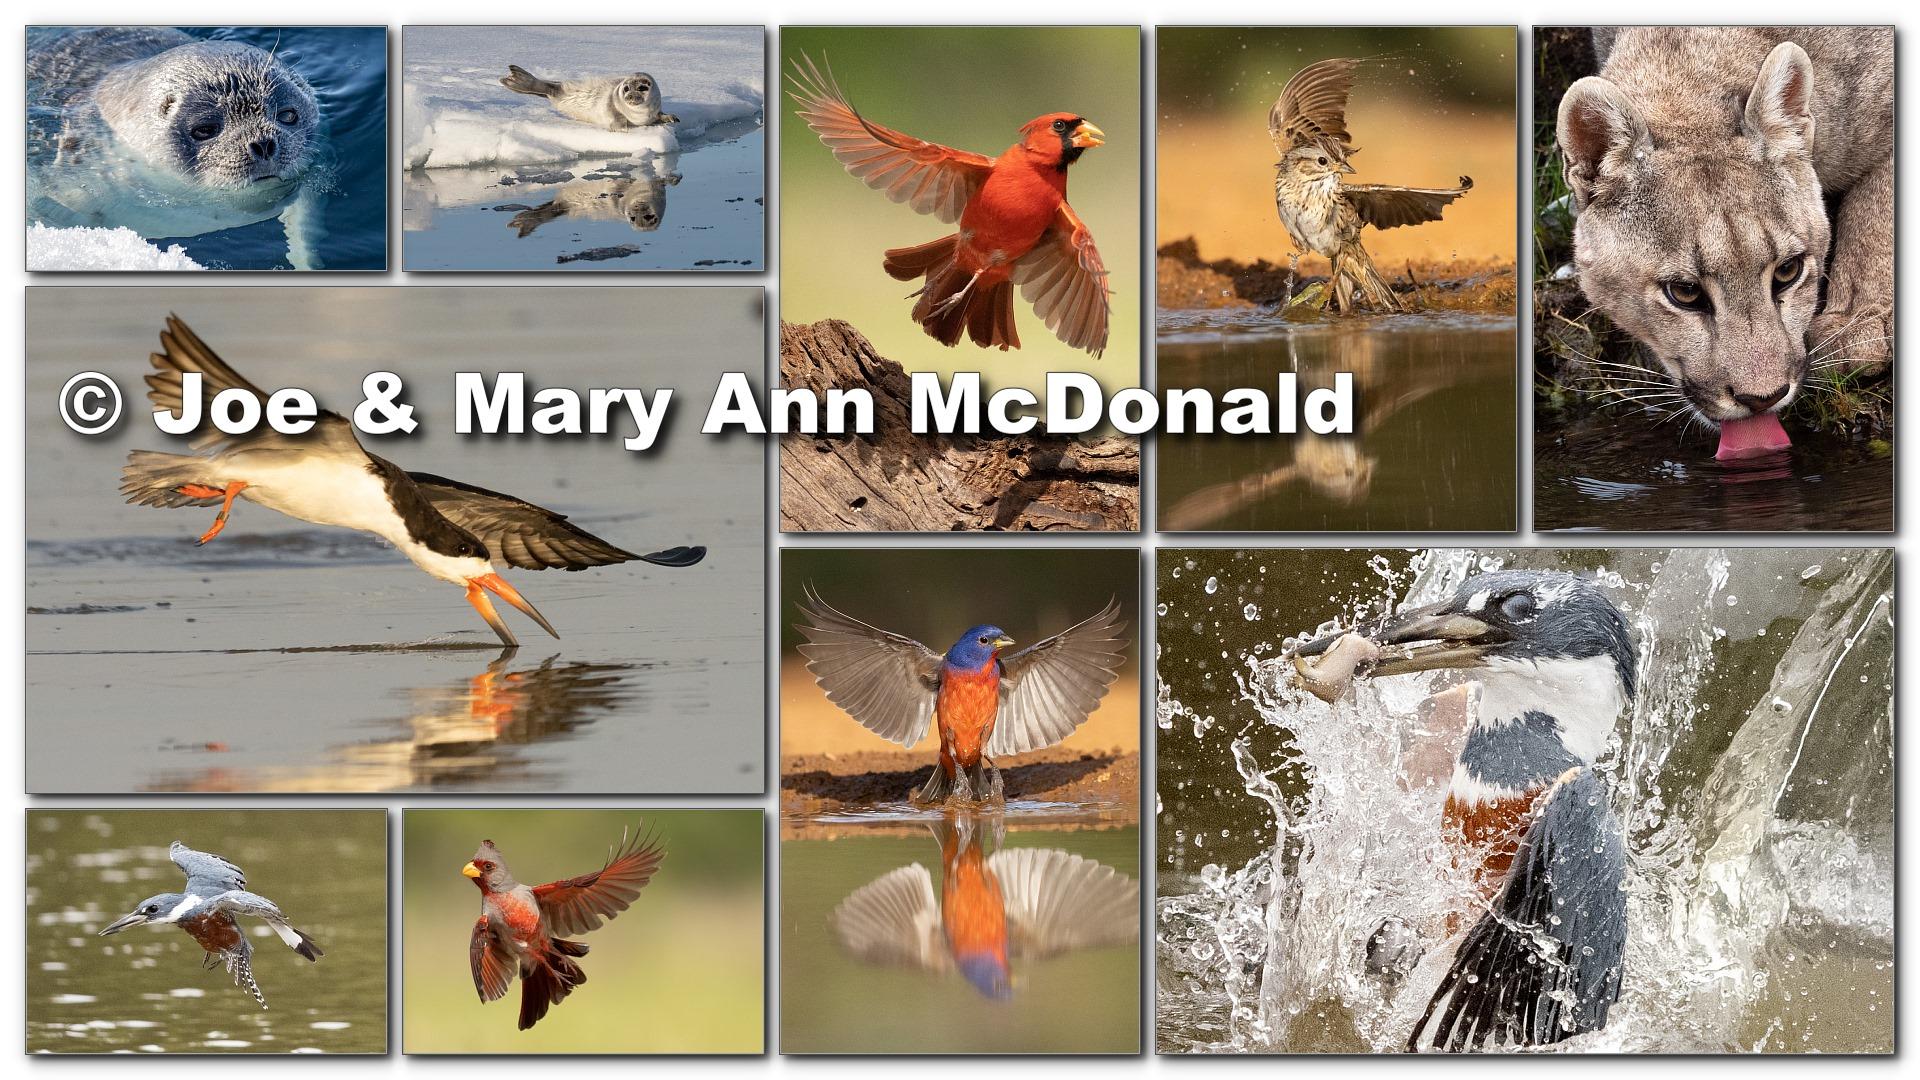 Joe & Mary Ann McDonald